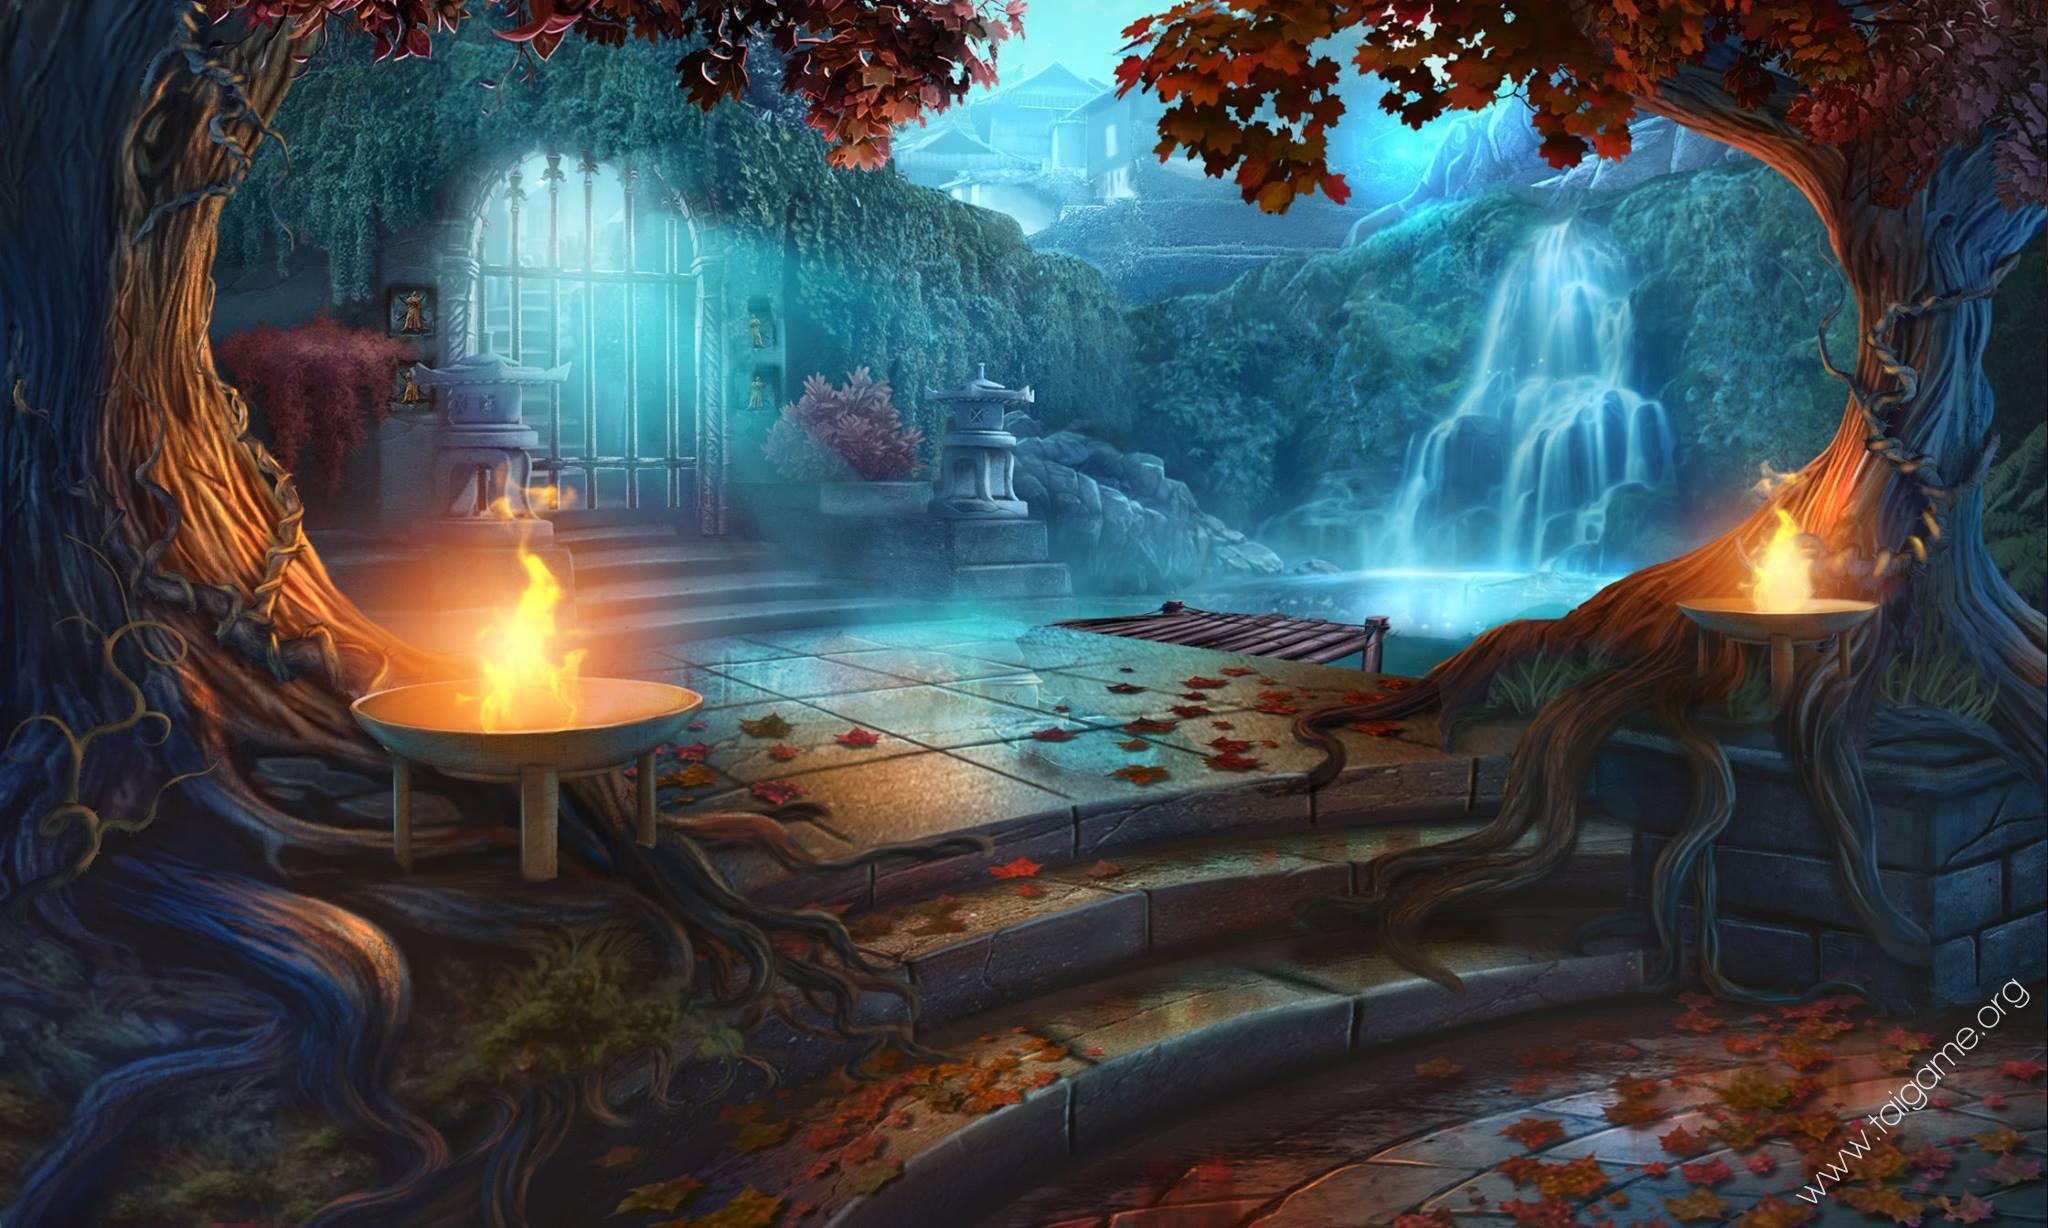 game and passage Torin's passage (aka странствия торина, מסעותיו של טורין, stranstvija torina, mas'otav shel torin), a really nice adventure game sold in.